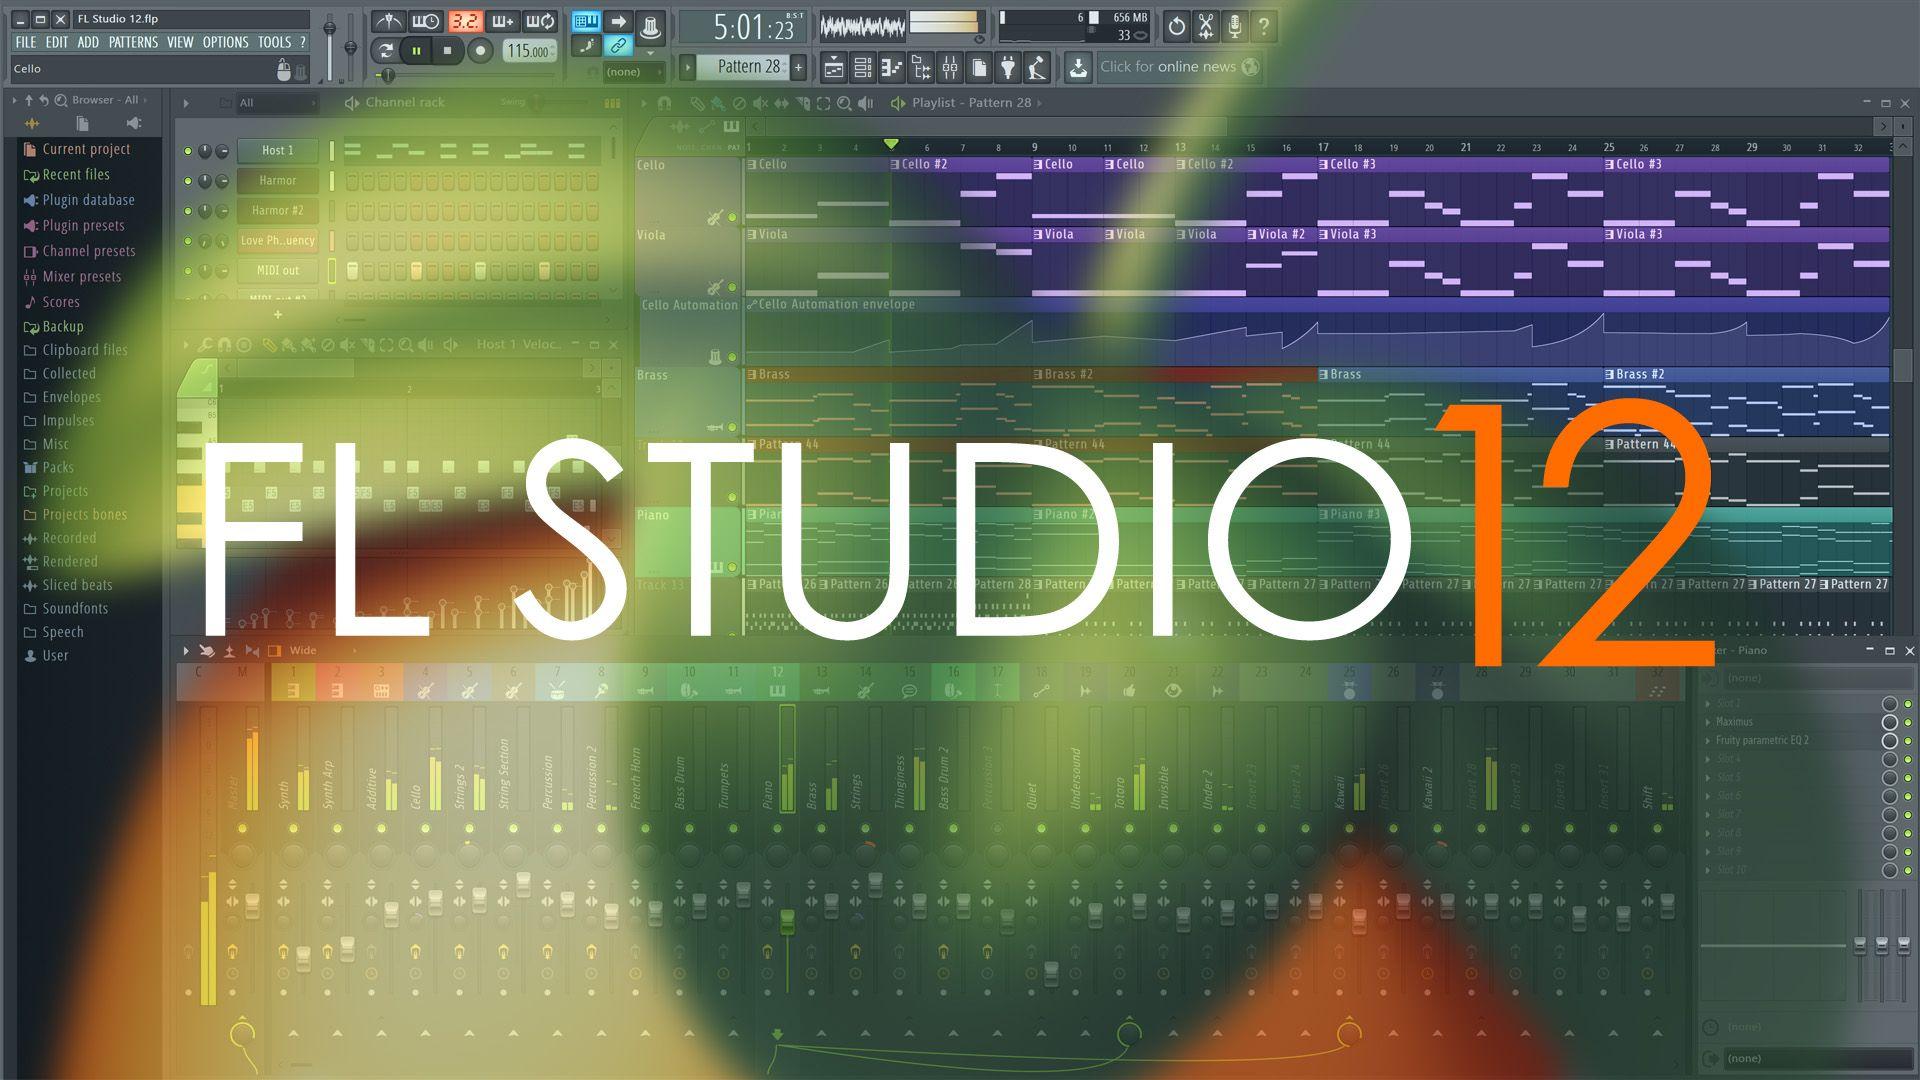 En studio crack fl con fire 12 media descargar español full Cubase 5